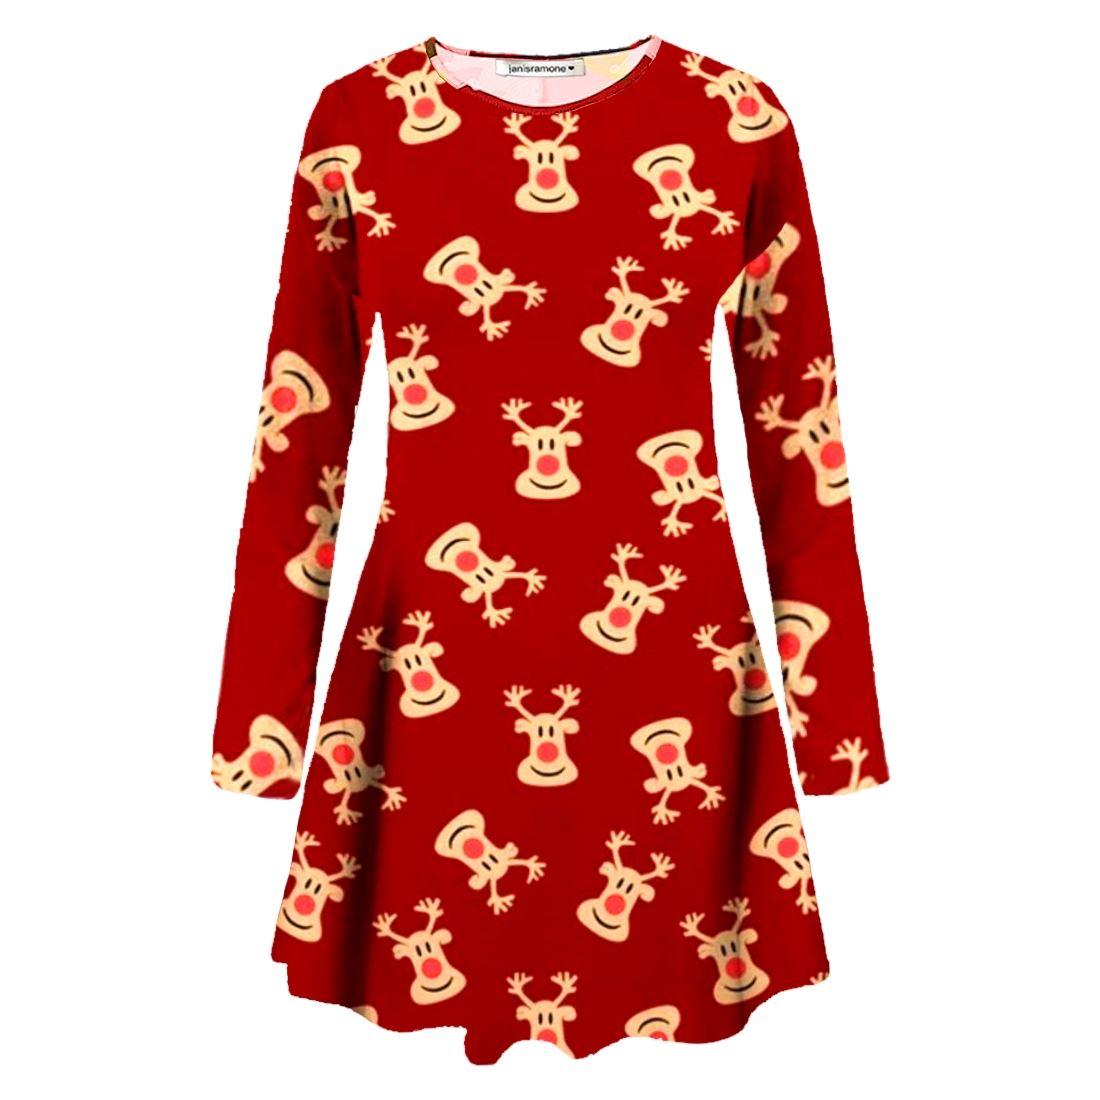 New-Womens-Christmas-Santa-Snowman-Penguin-Gift-Maternity-Xmas-Swing-Dress-UK